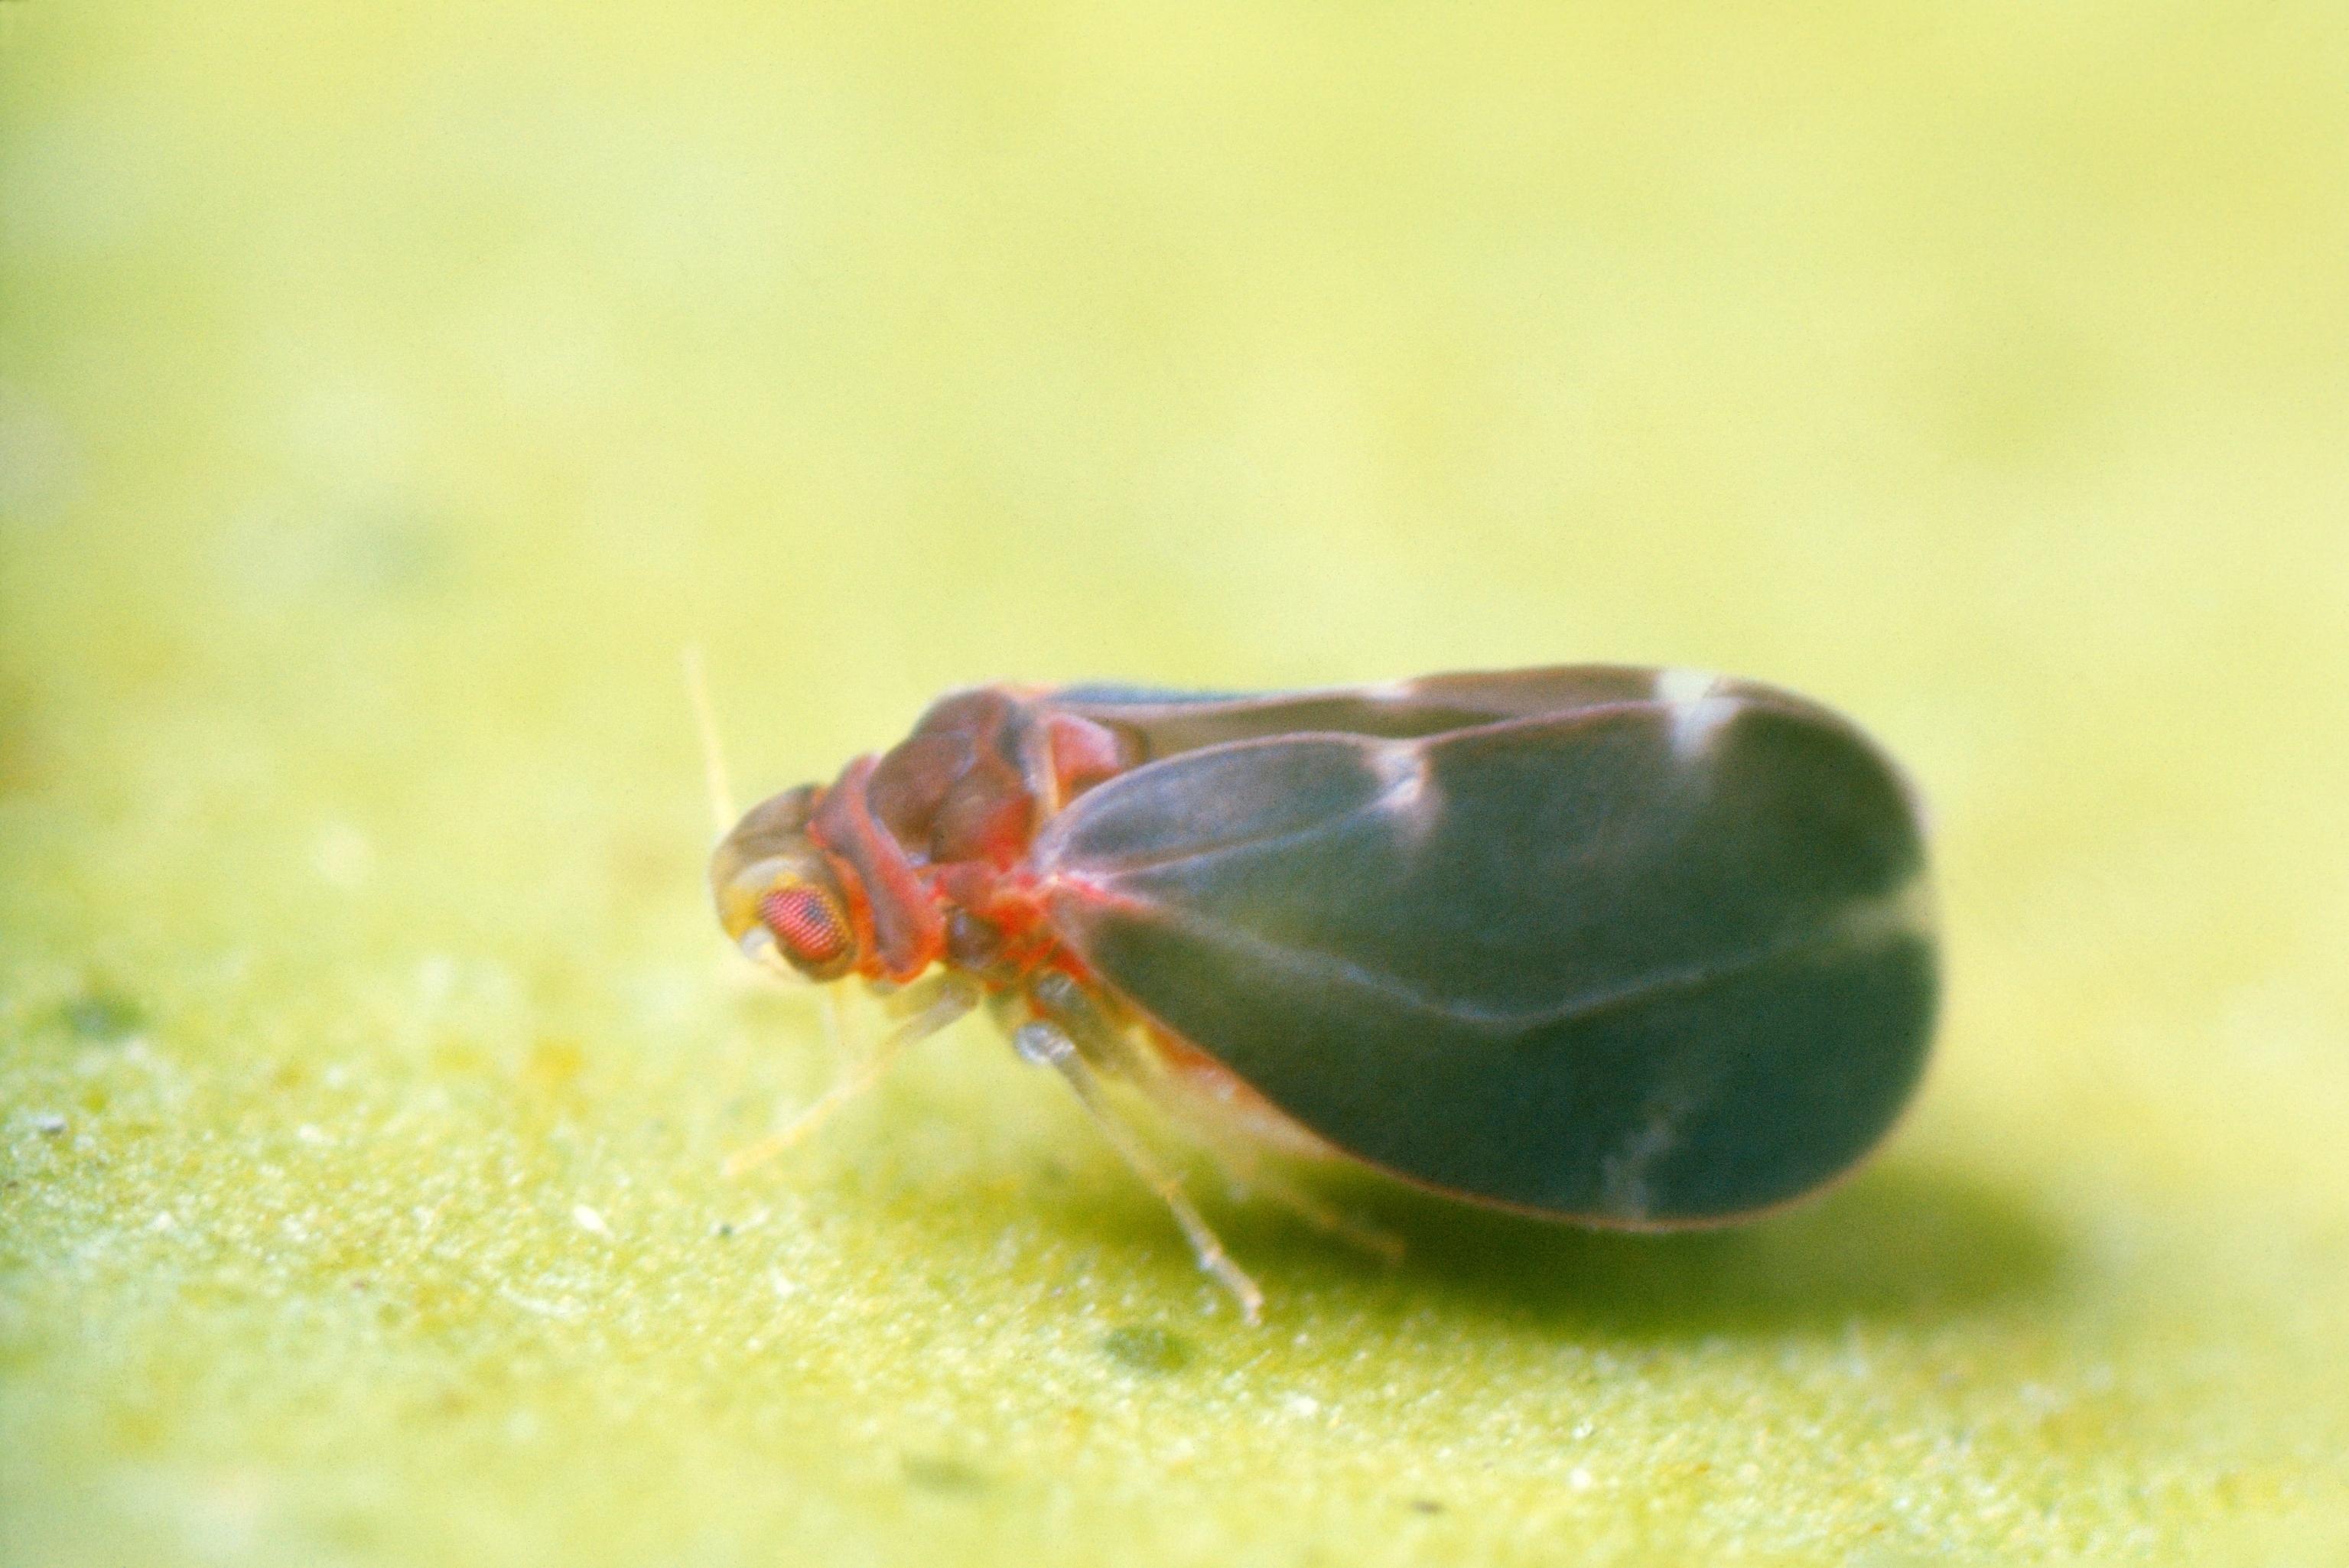 Image of Citrus blackfly